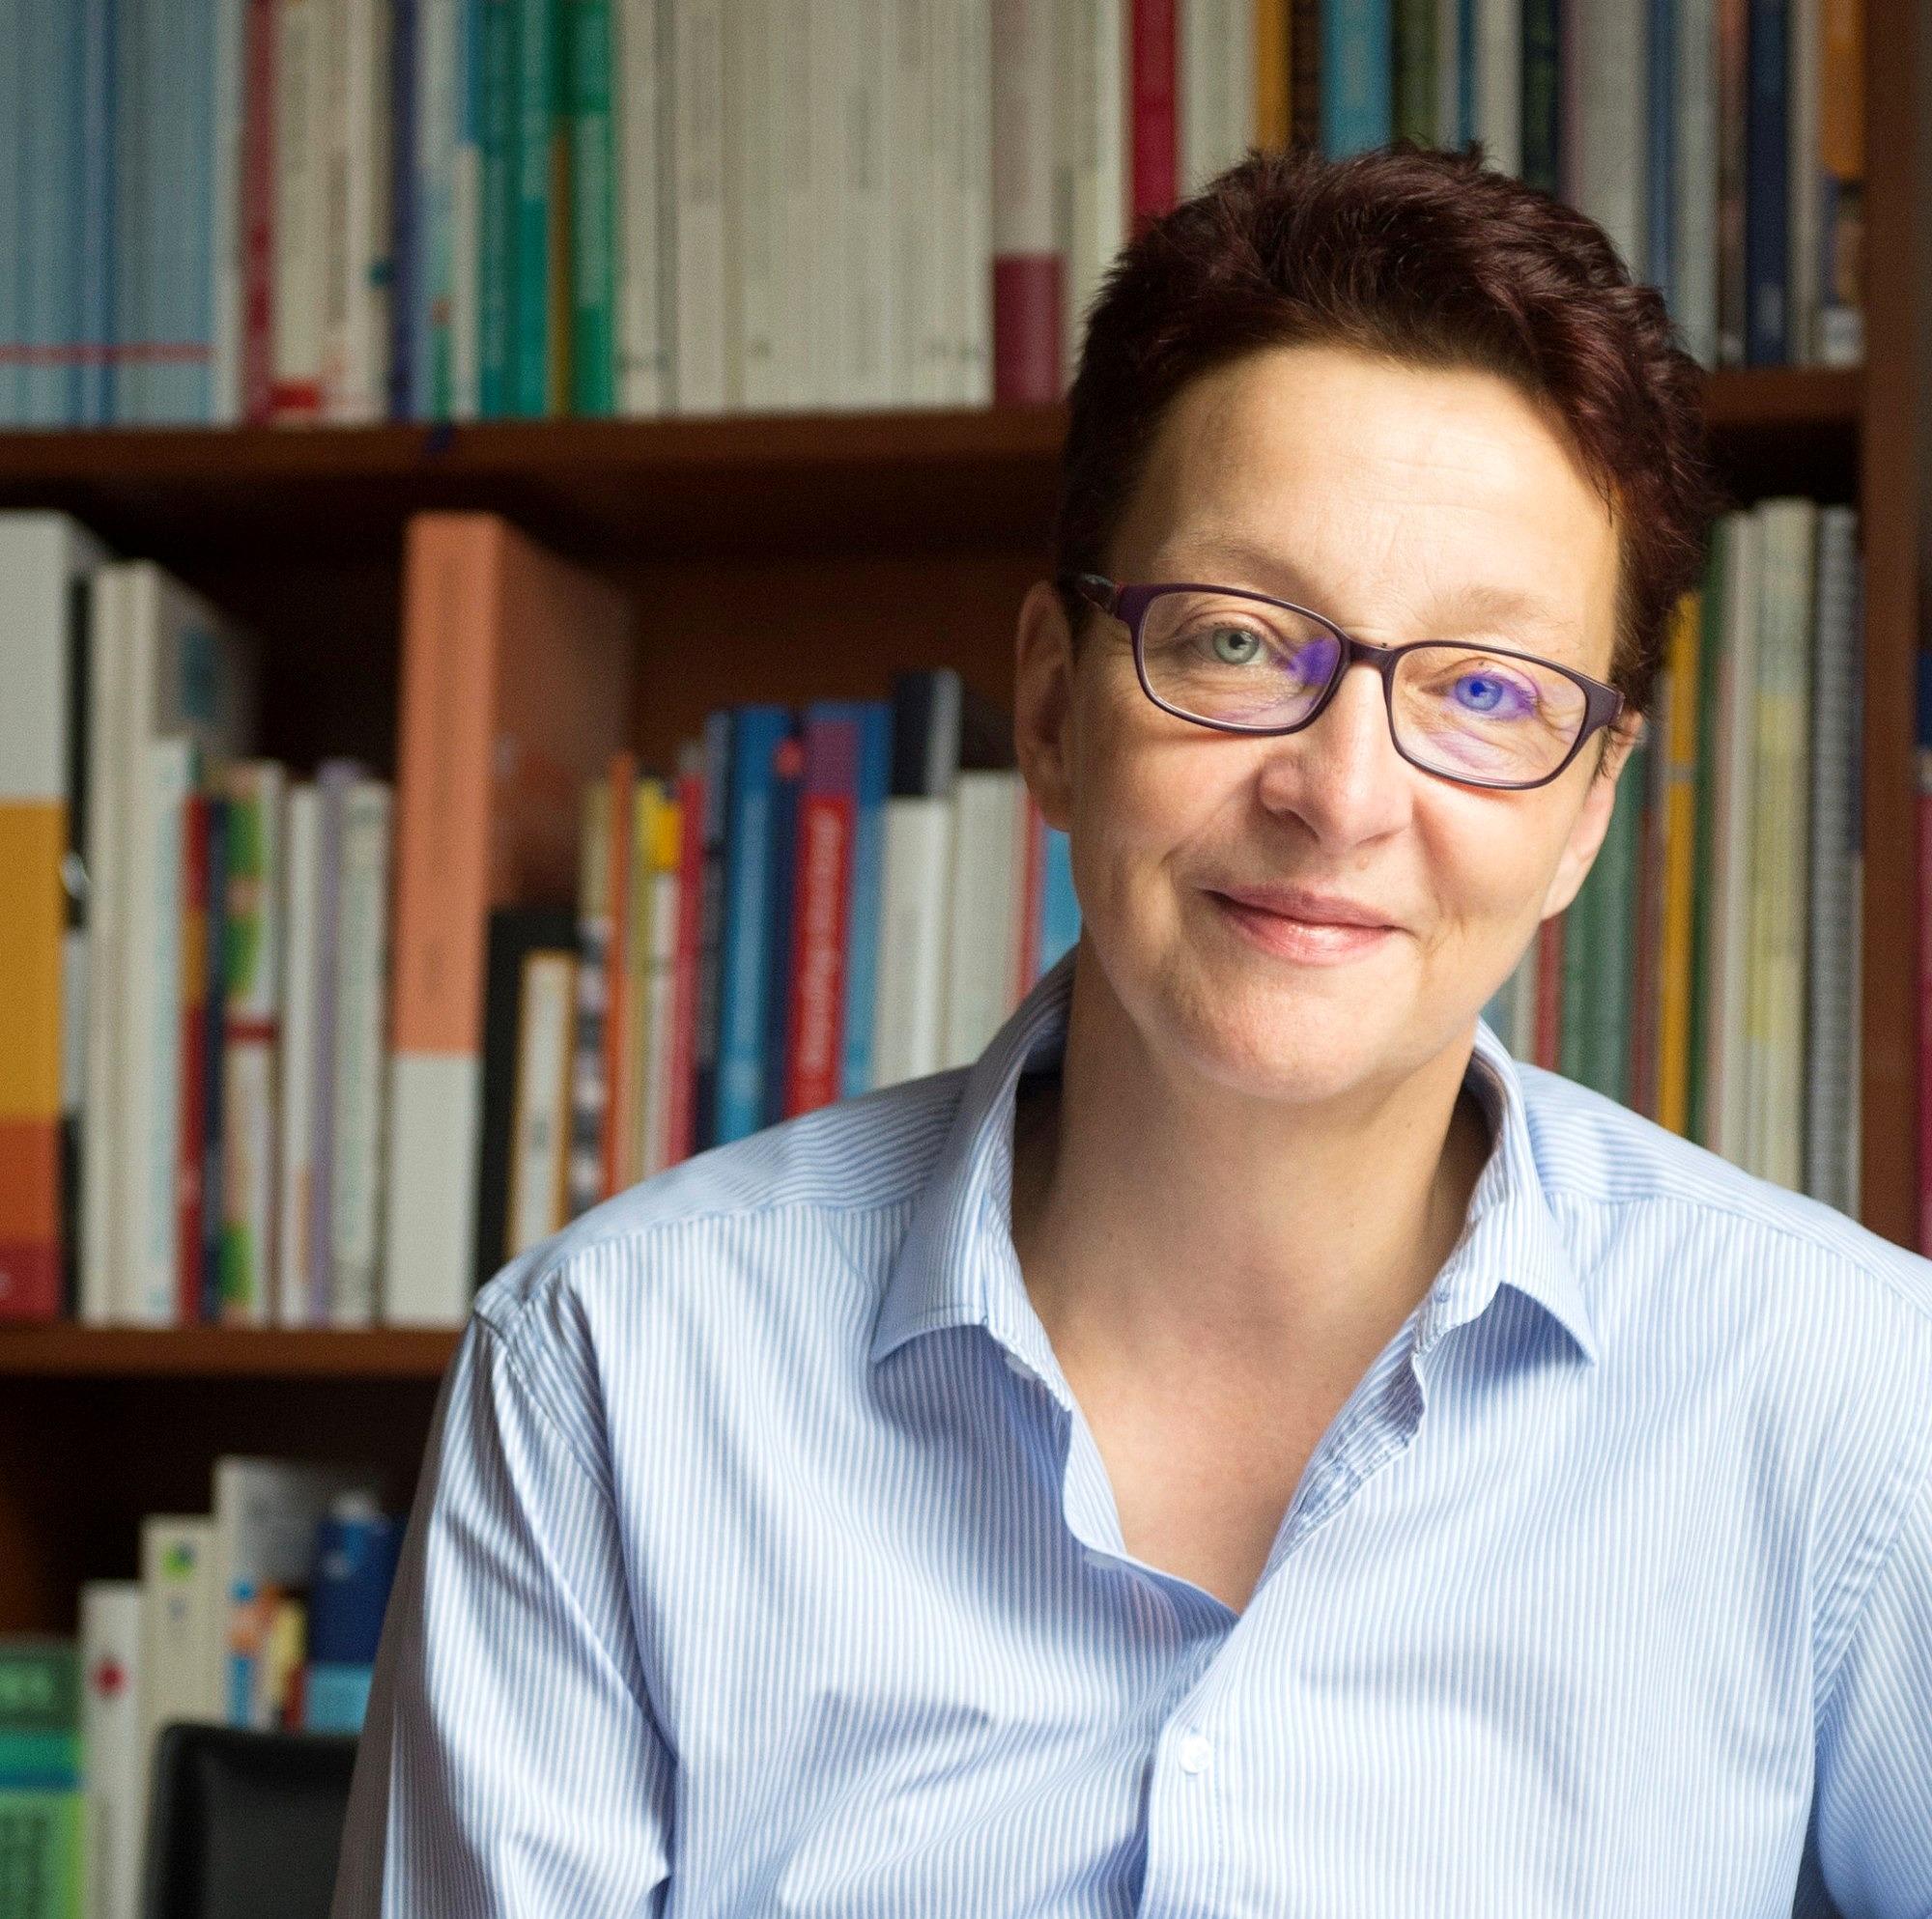 Prof. Dr. Sabine Engel